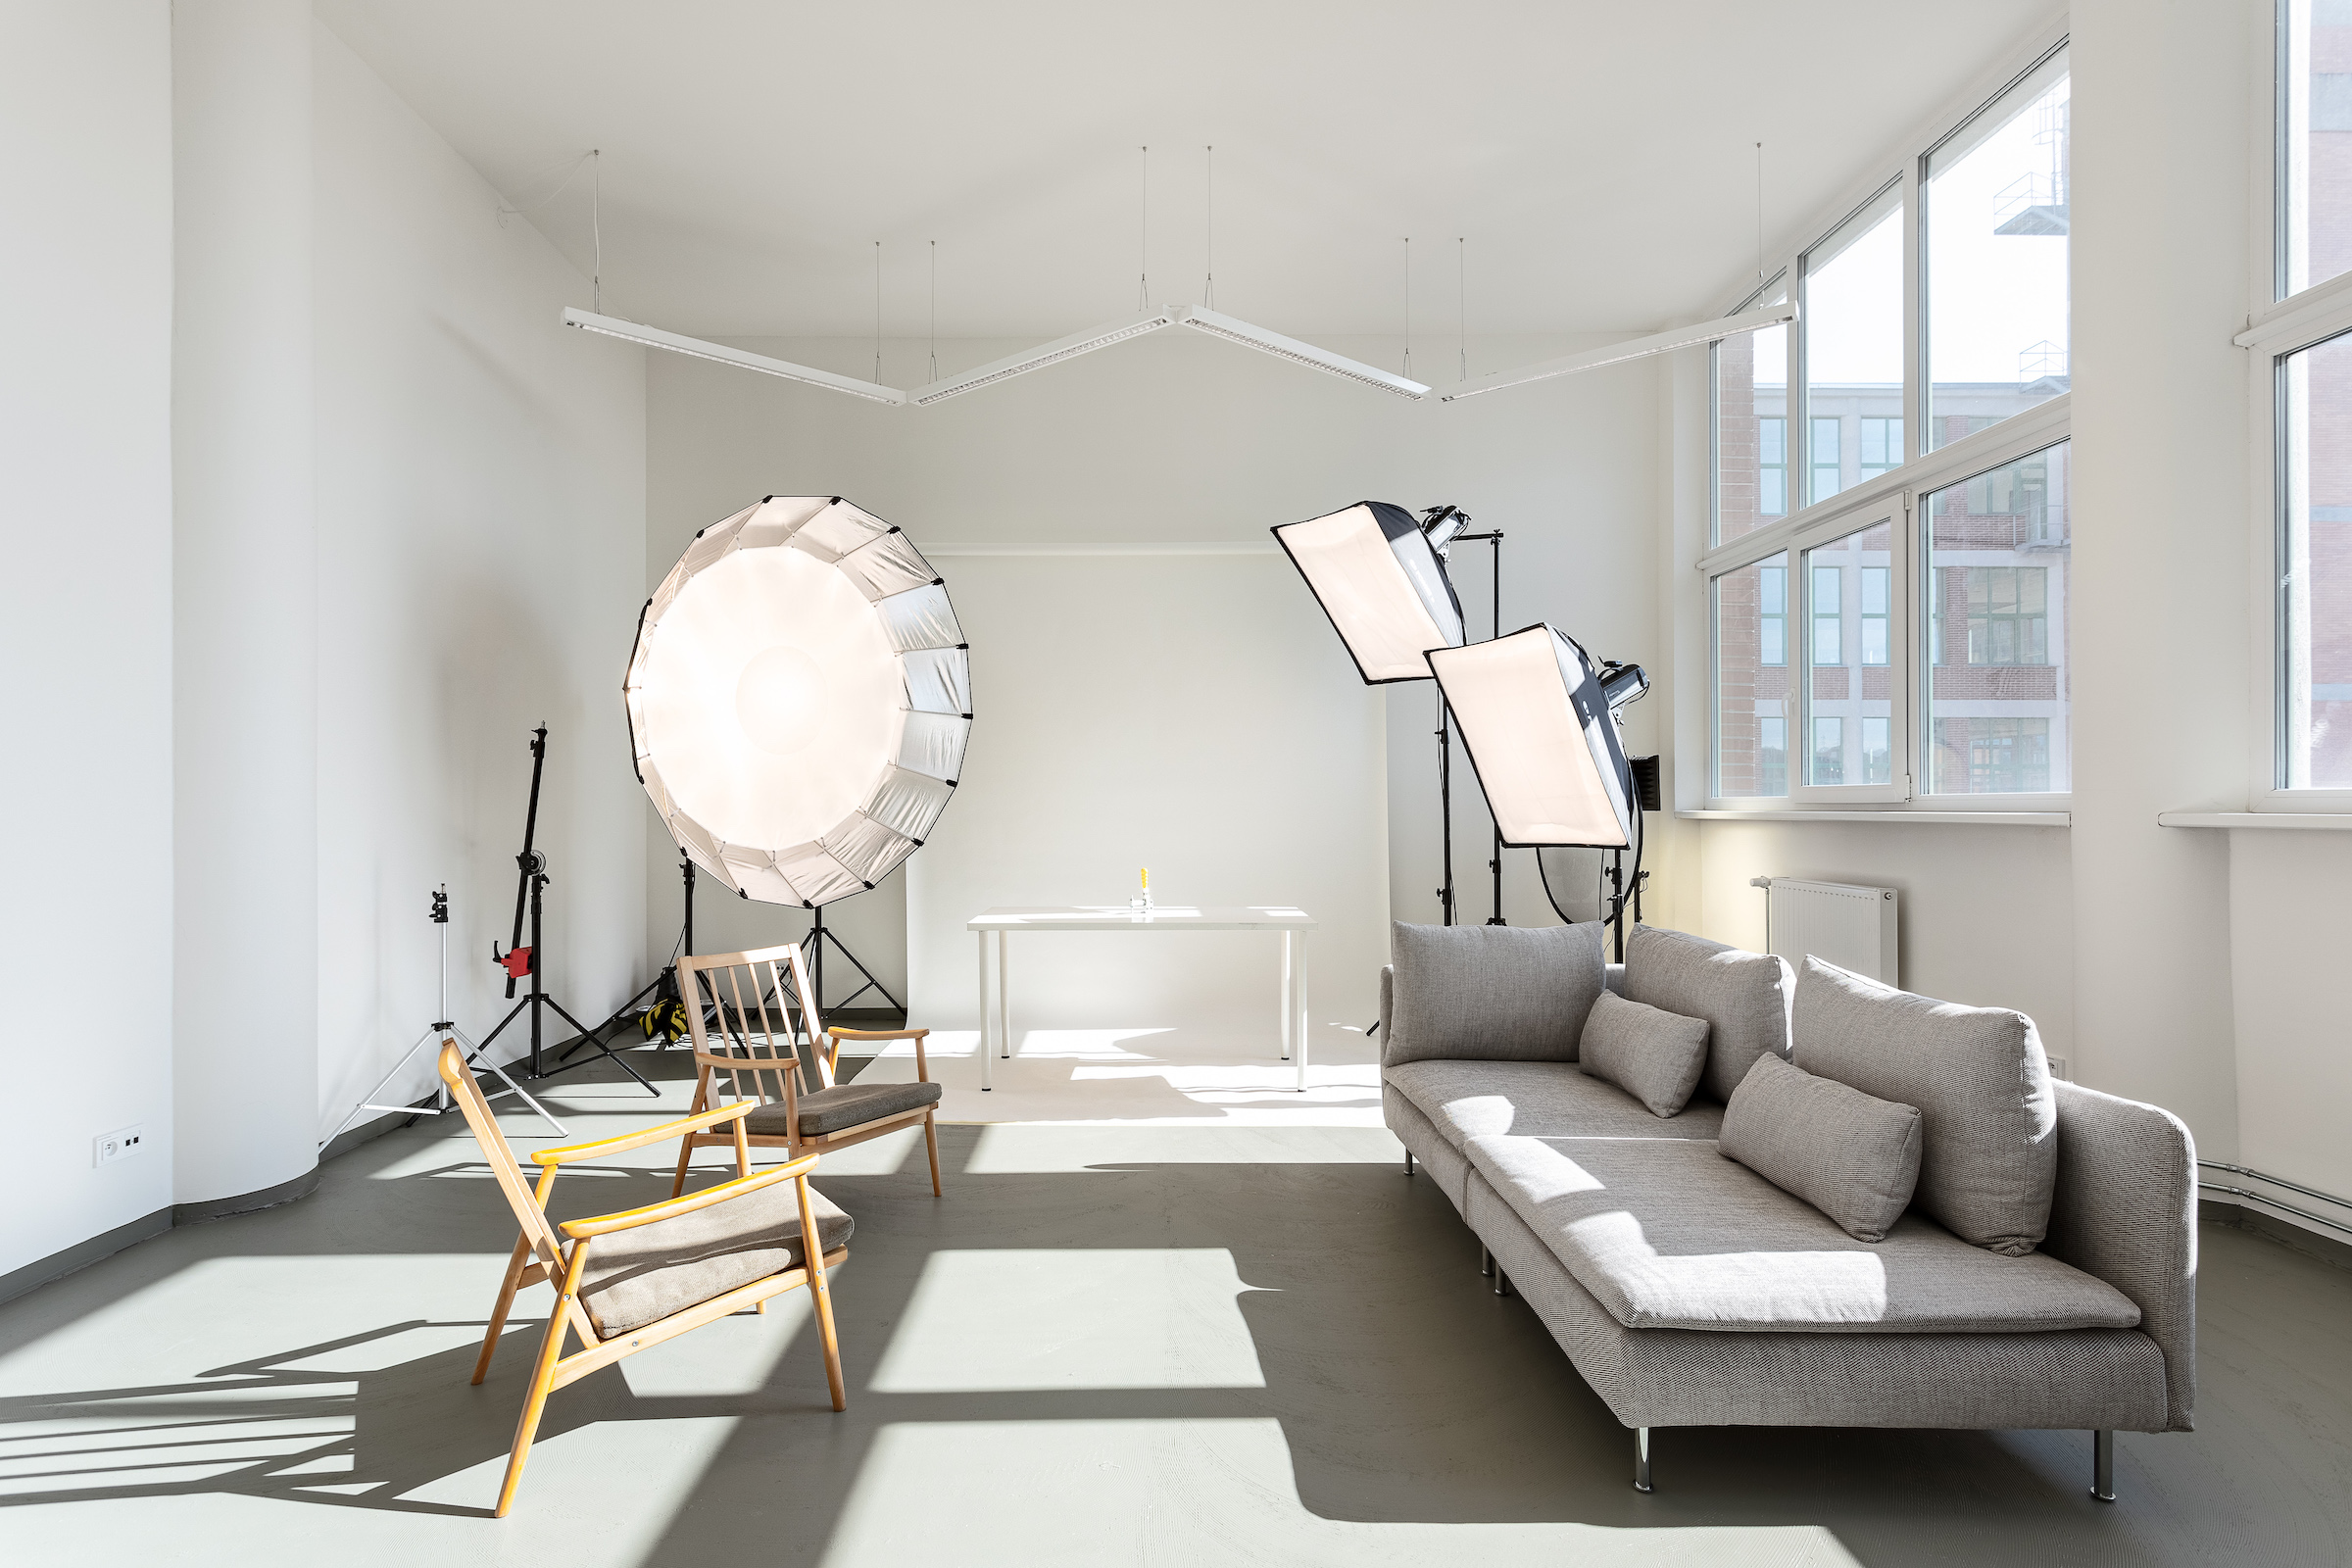 Nový fotoateliér KHS. Návrh interiéru: Studio Cosmo